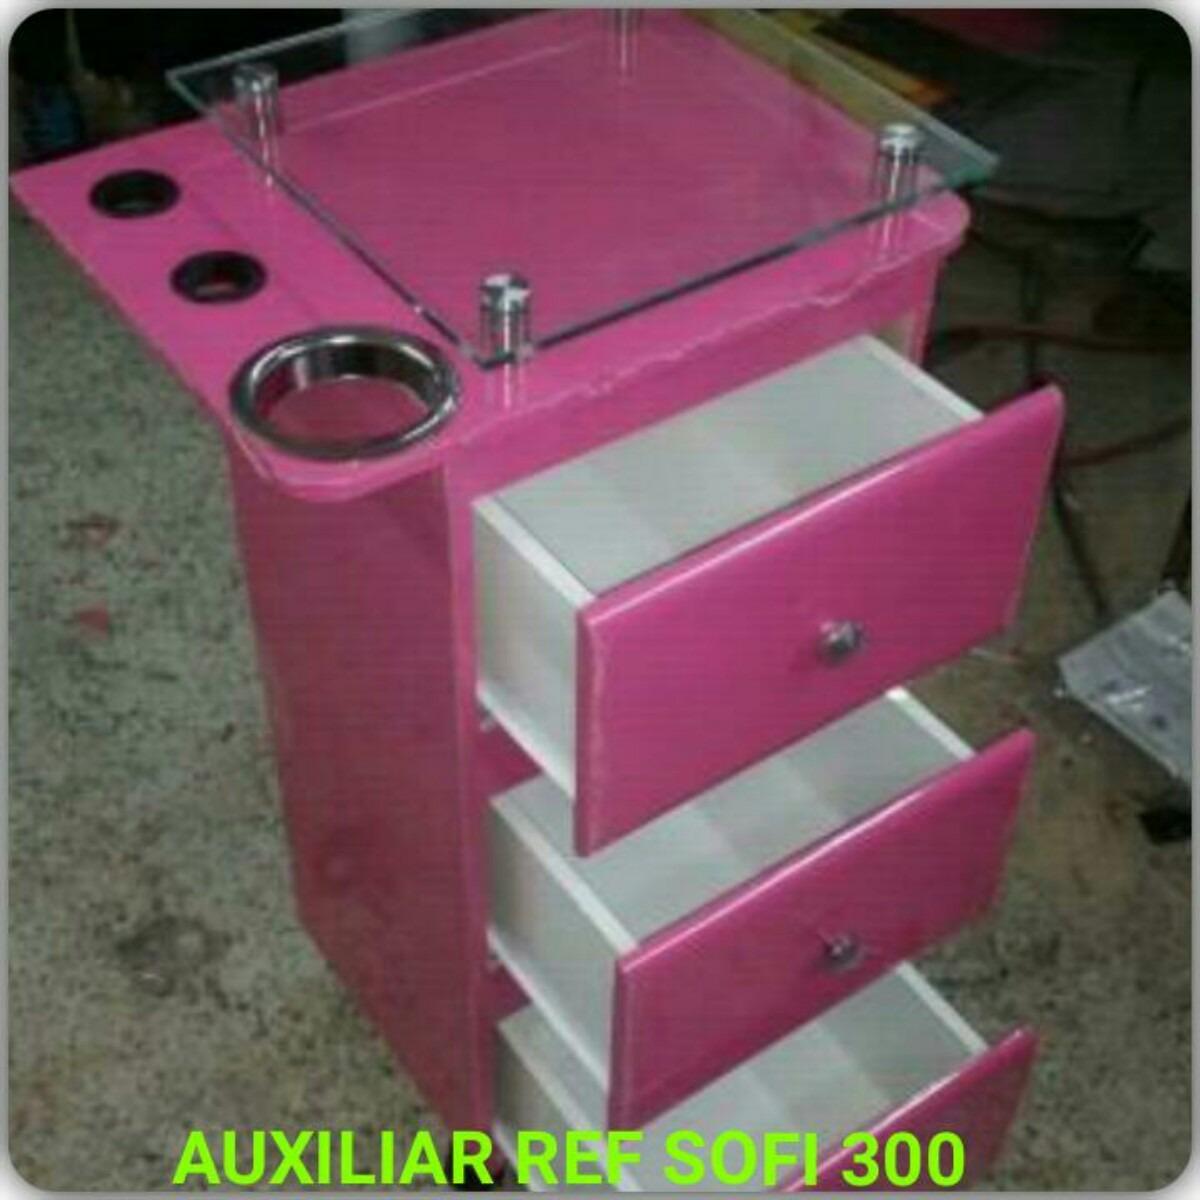 Fabricas De Muebles De Peluqueria : Fabrica de muebles peluqueria mesas auxiliares